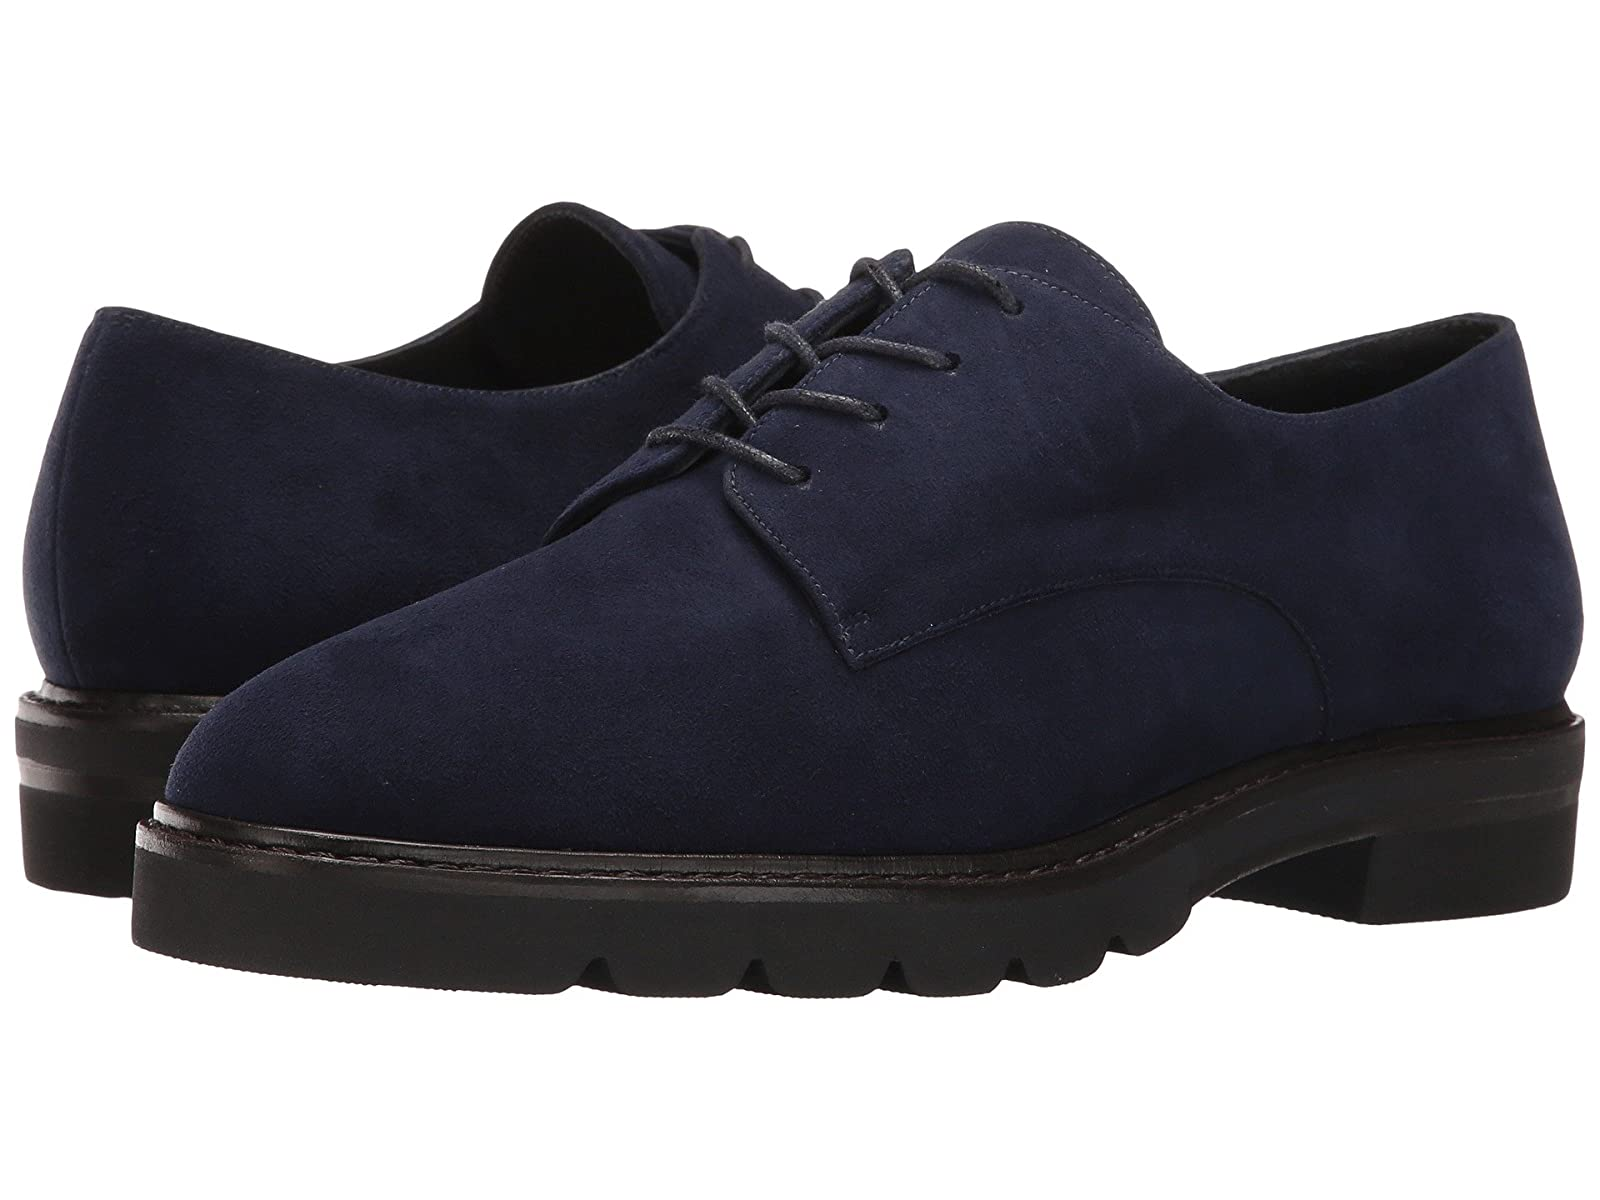 Stuart Weitzman MetroCheap and distinctive eye-catching shoes